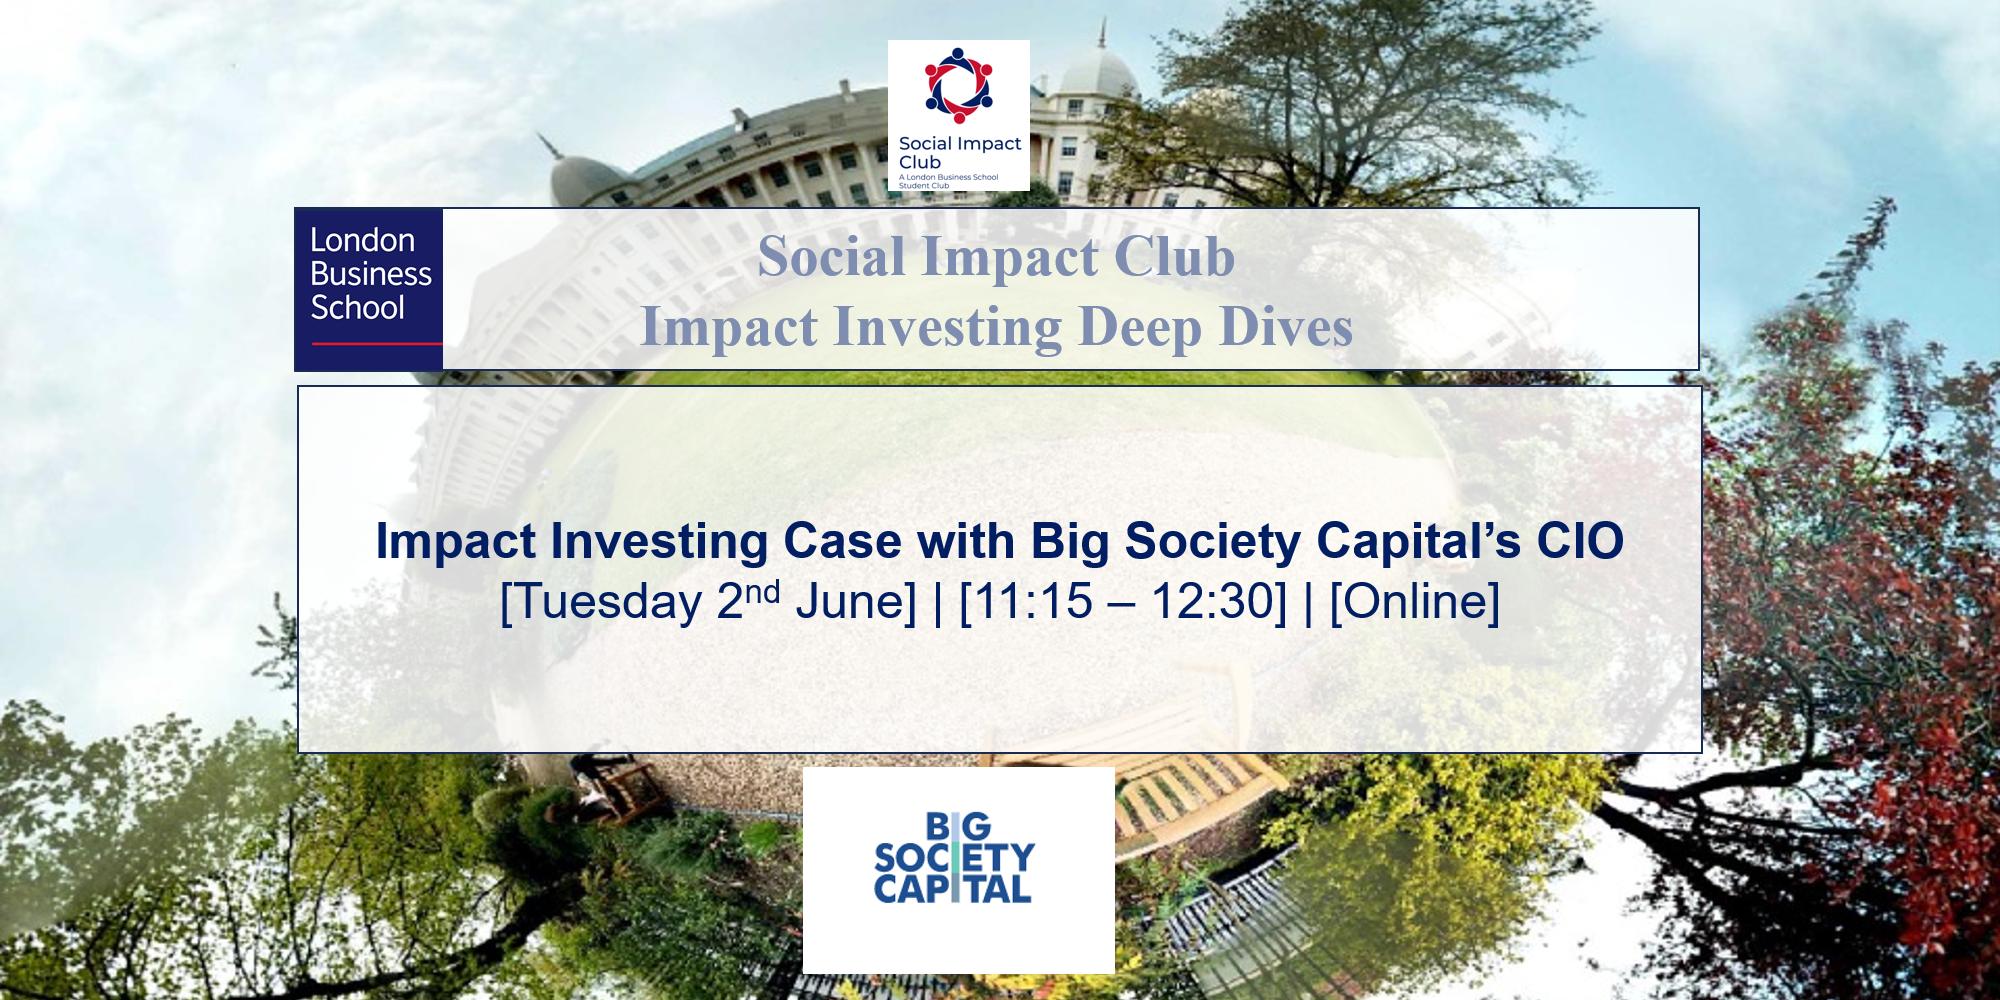 Impact Investing case with Big Society Capital's CIO